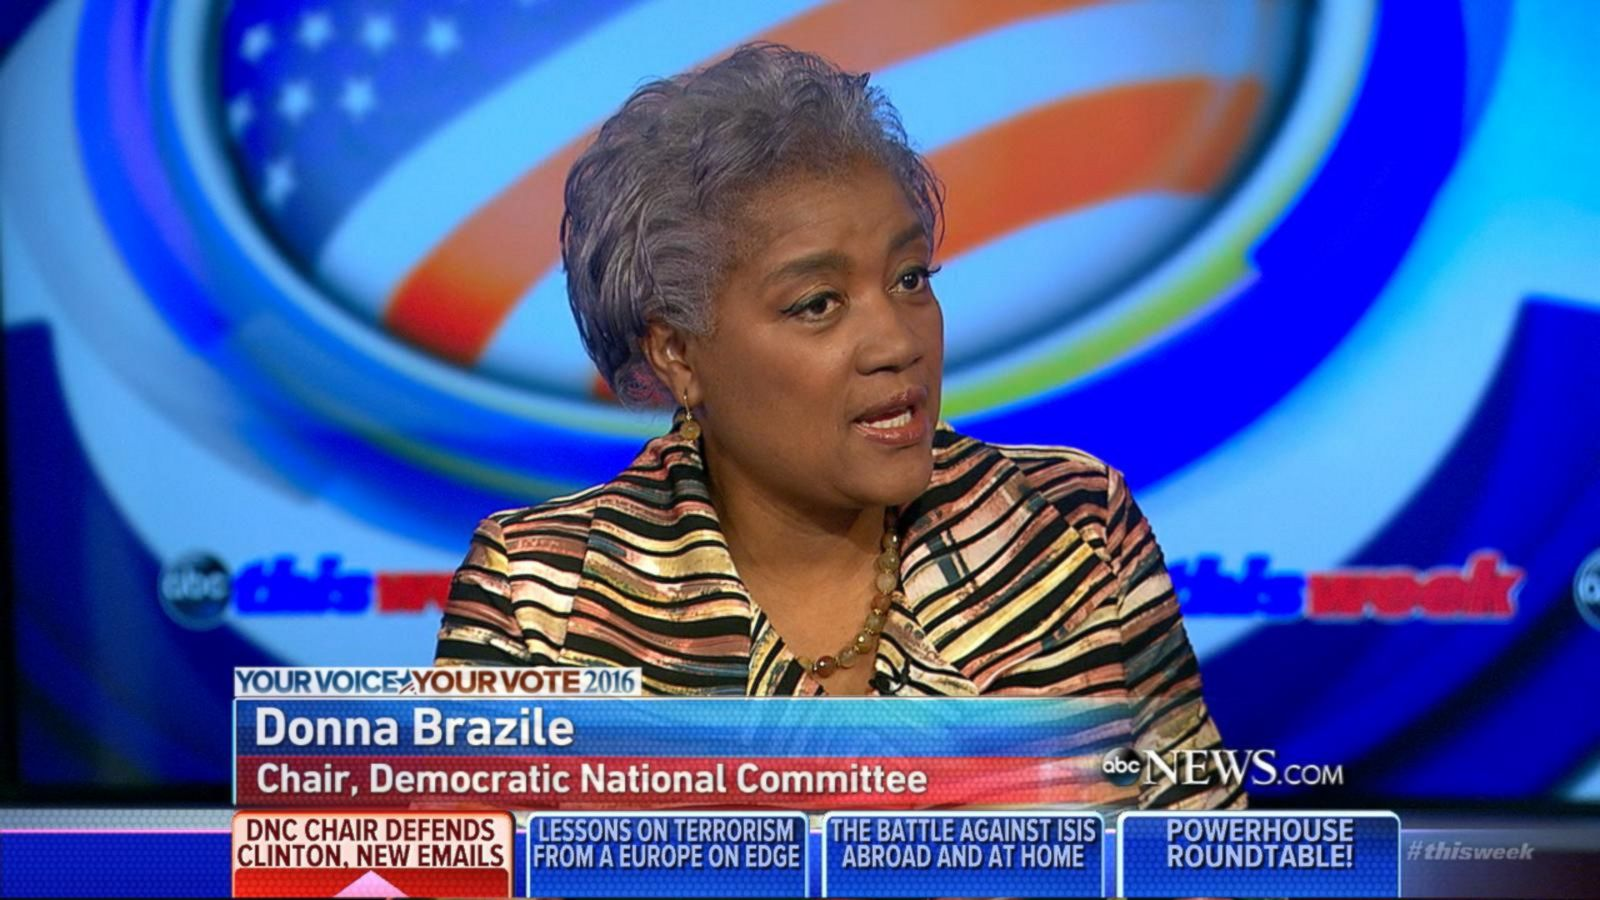 VIDEO: DNC Chair Donna Brazile on 2016 Presidential Race